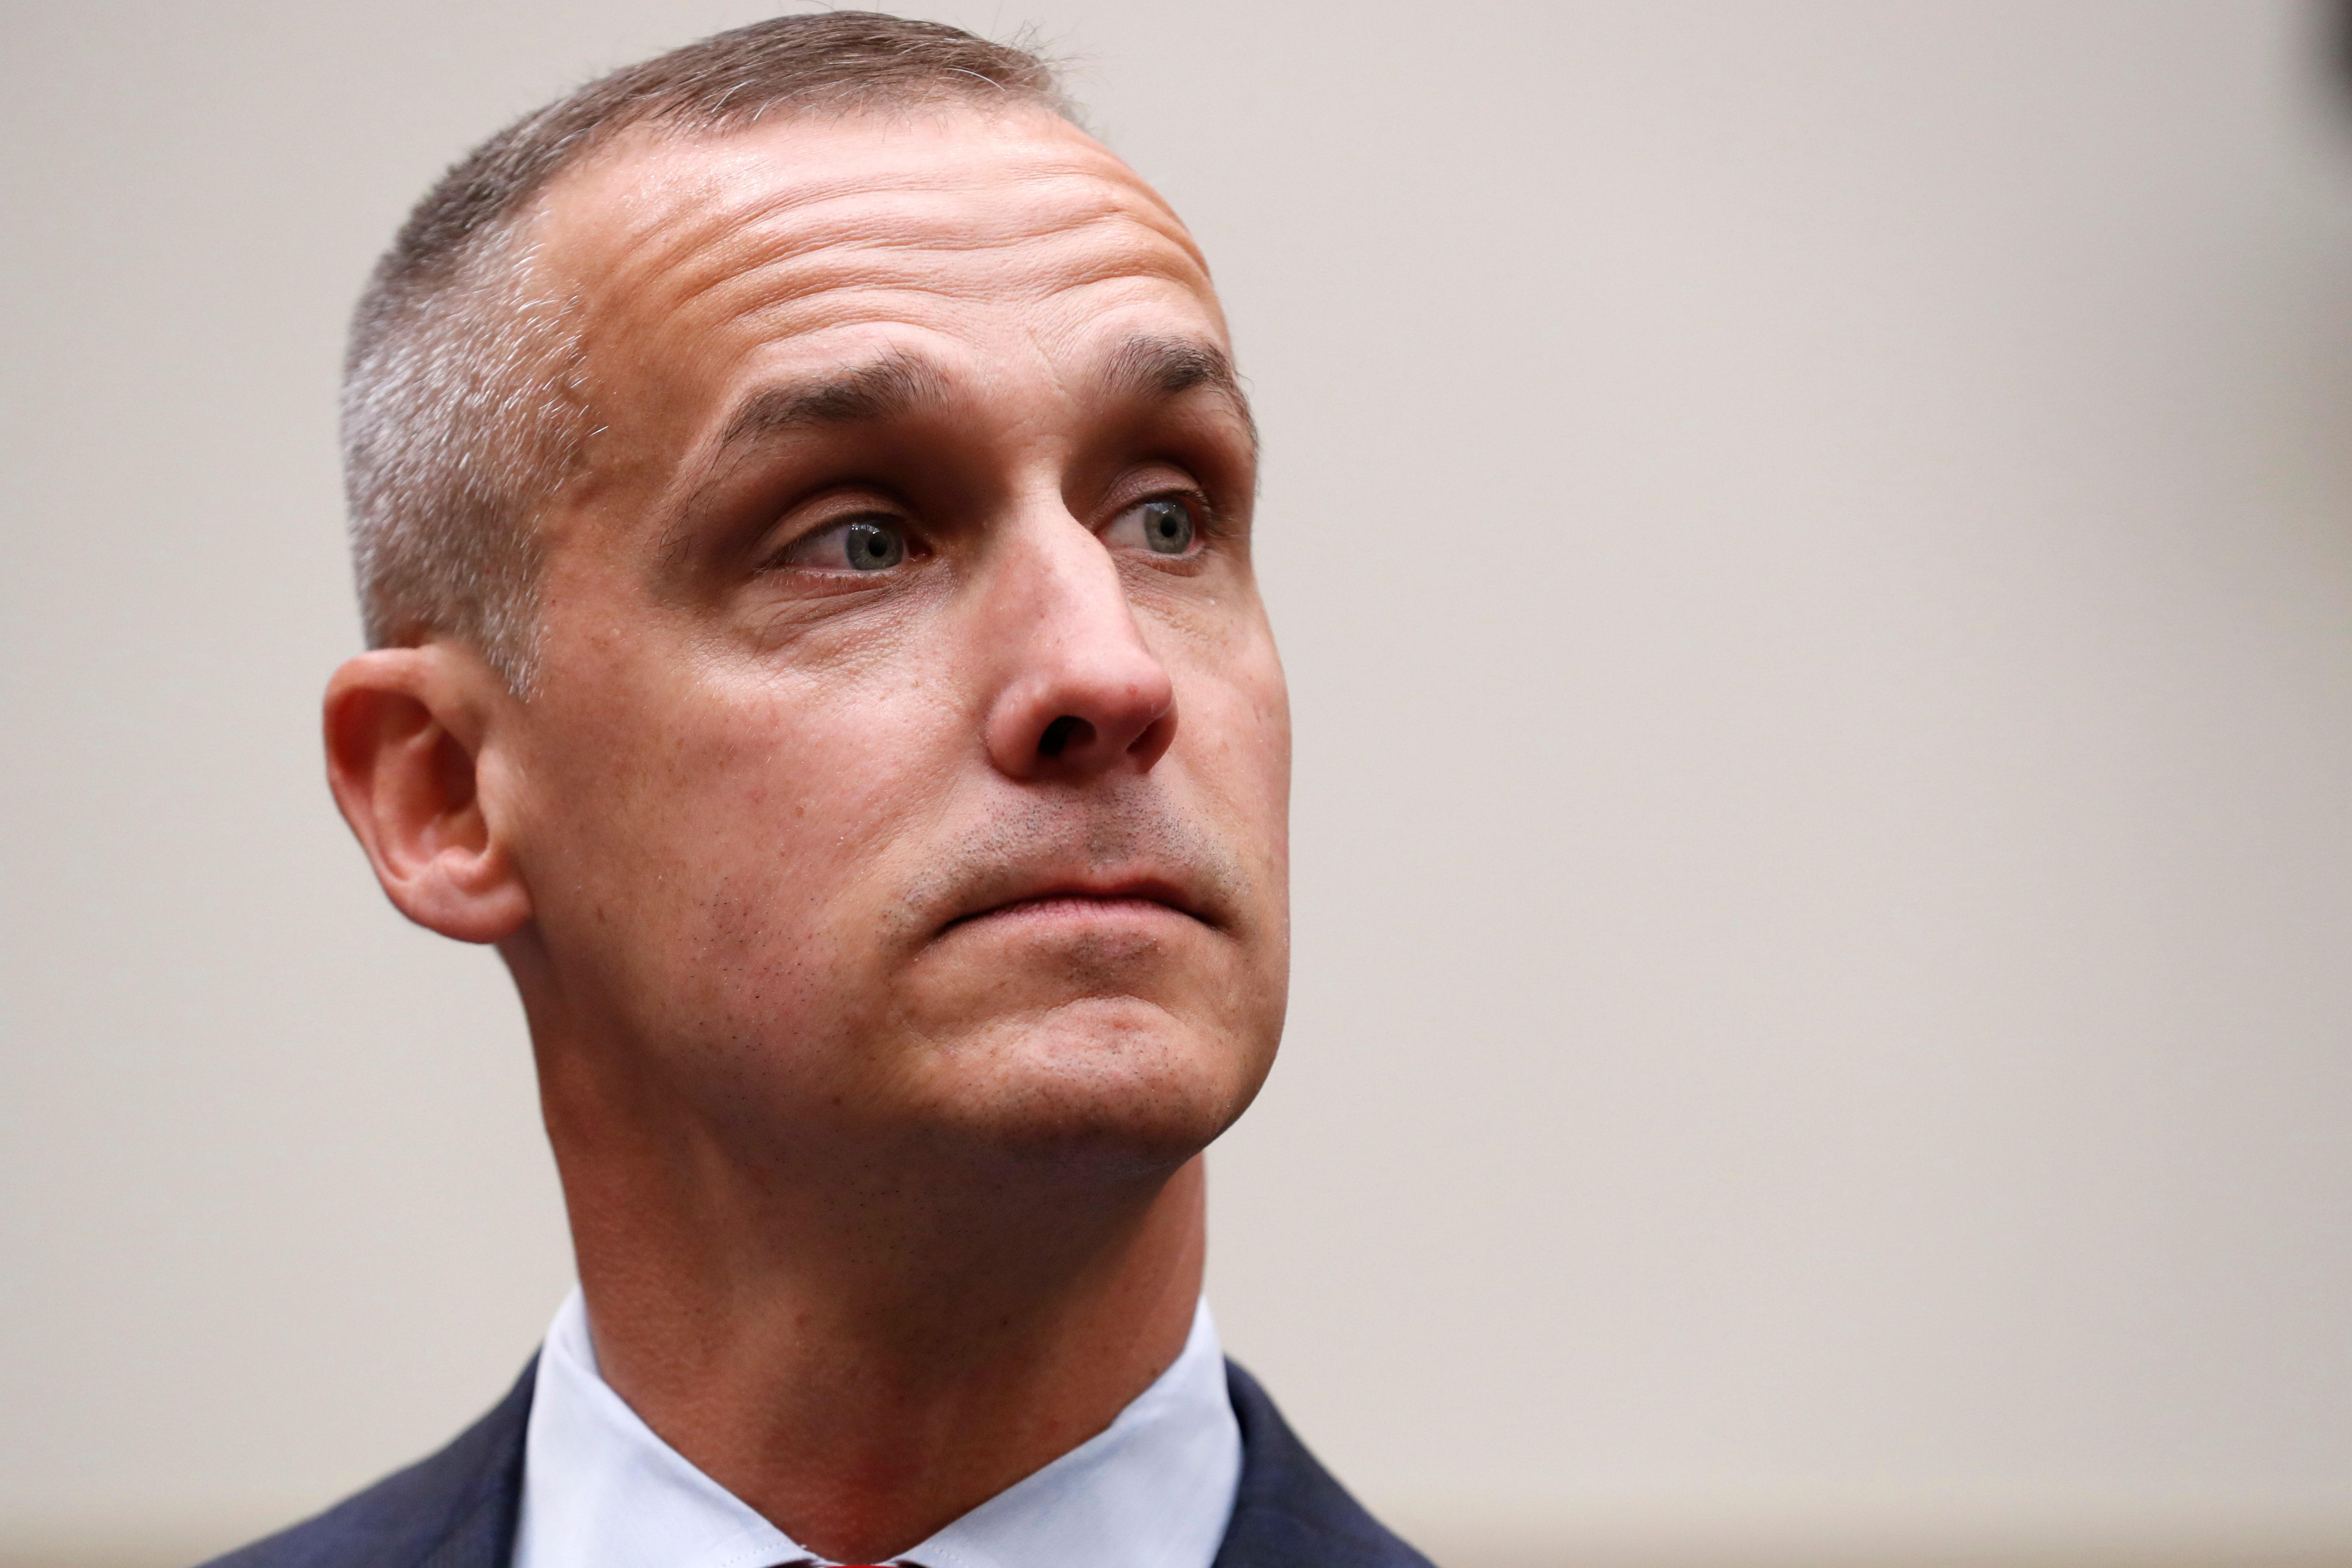 Corey Lewandowski teases 'potential senate run' with new website